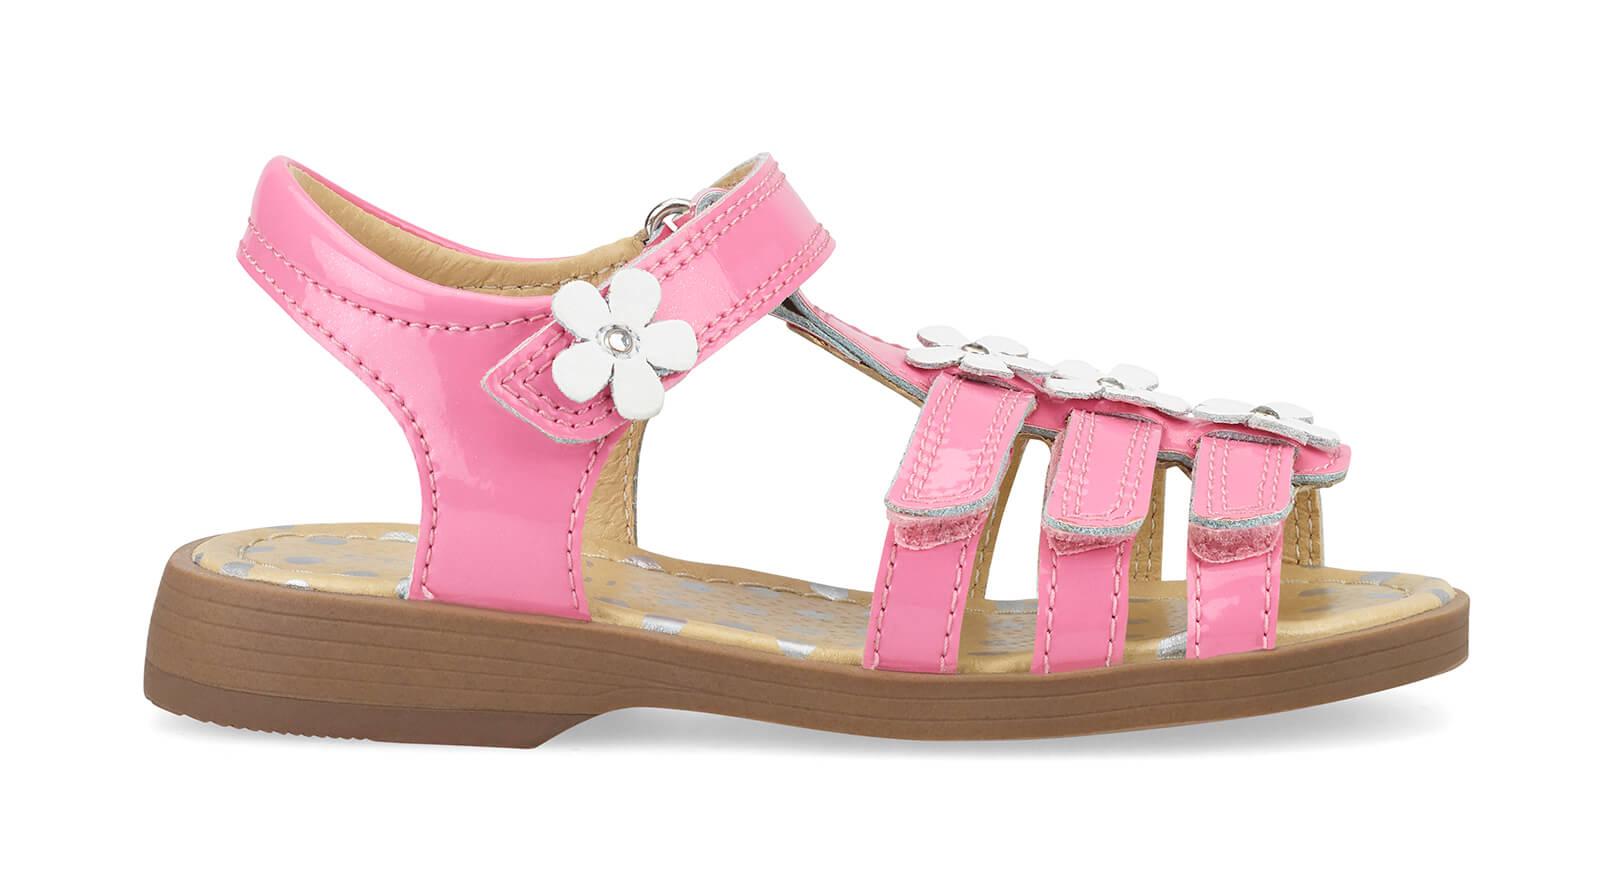 Picnic pink sandals